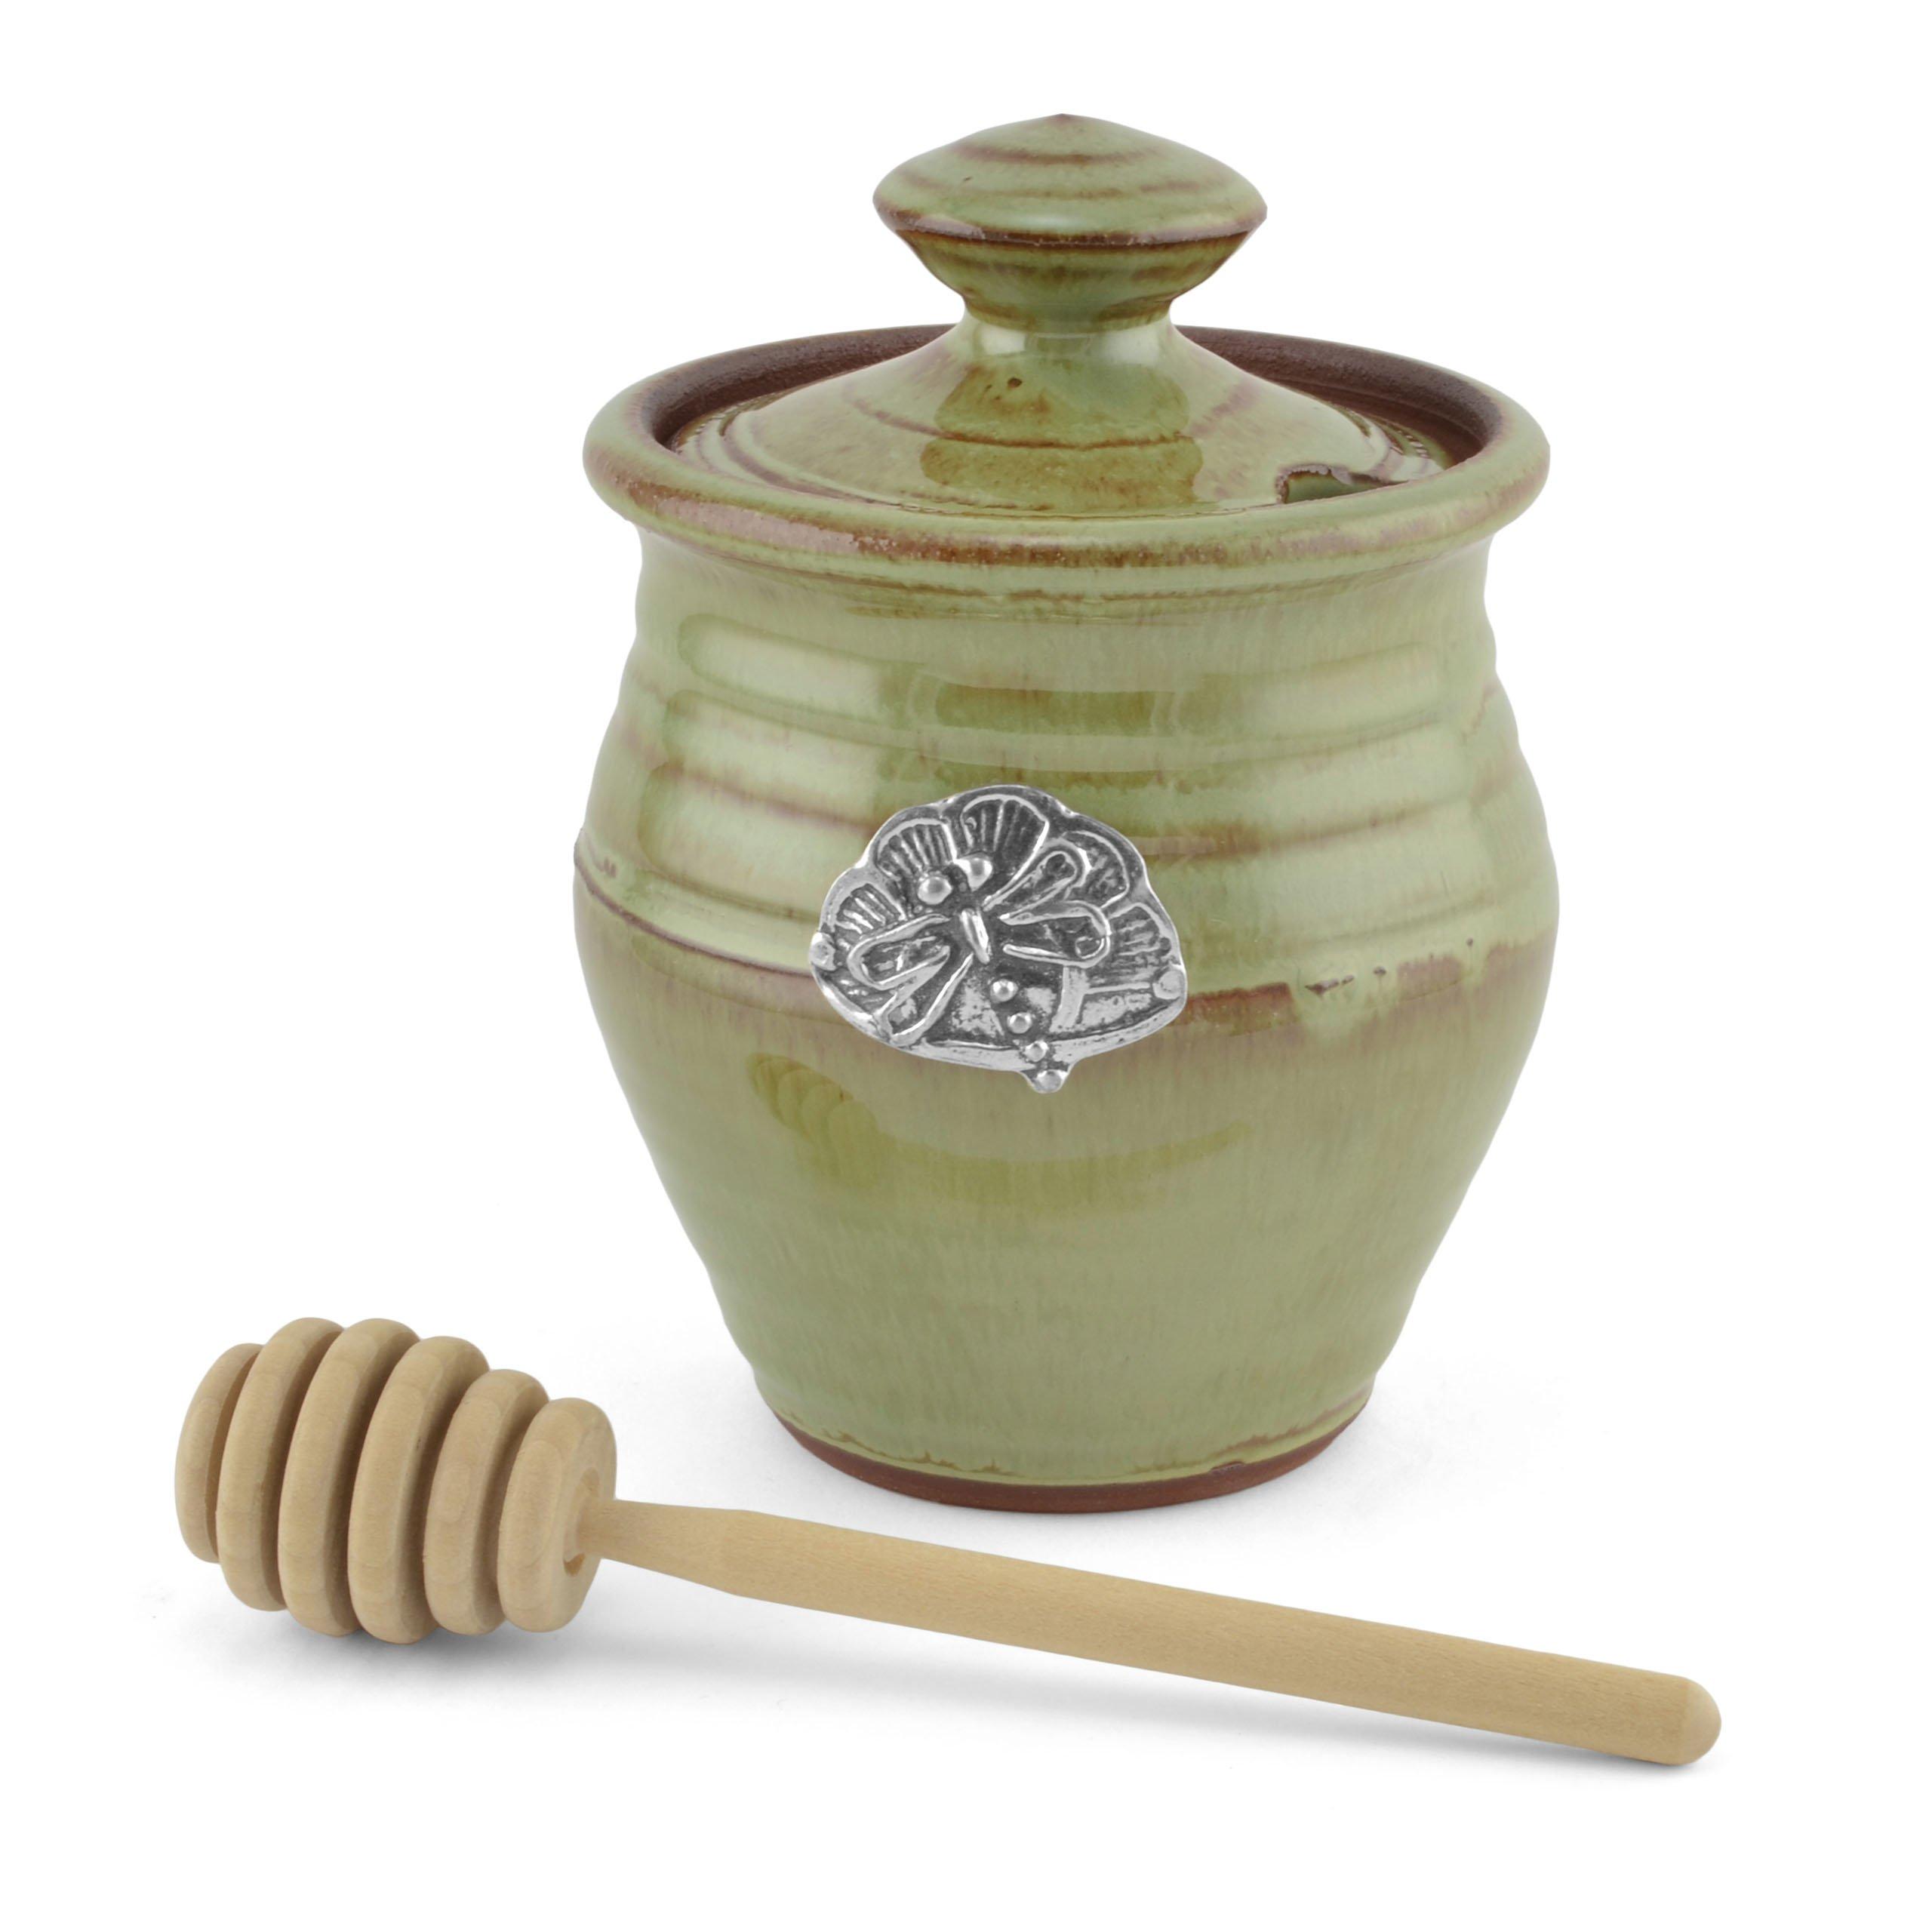 Oregon Stoneware Studio Dragonfly Honey Pot, Pistachio by Oregon Stoneware Studio